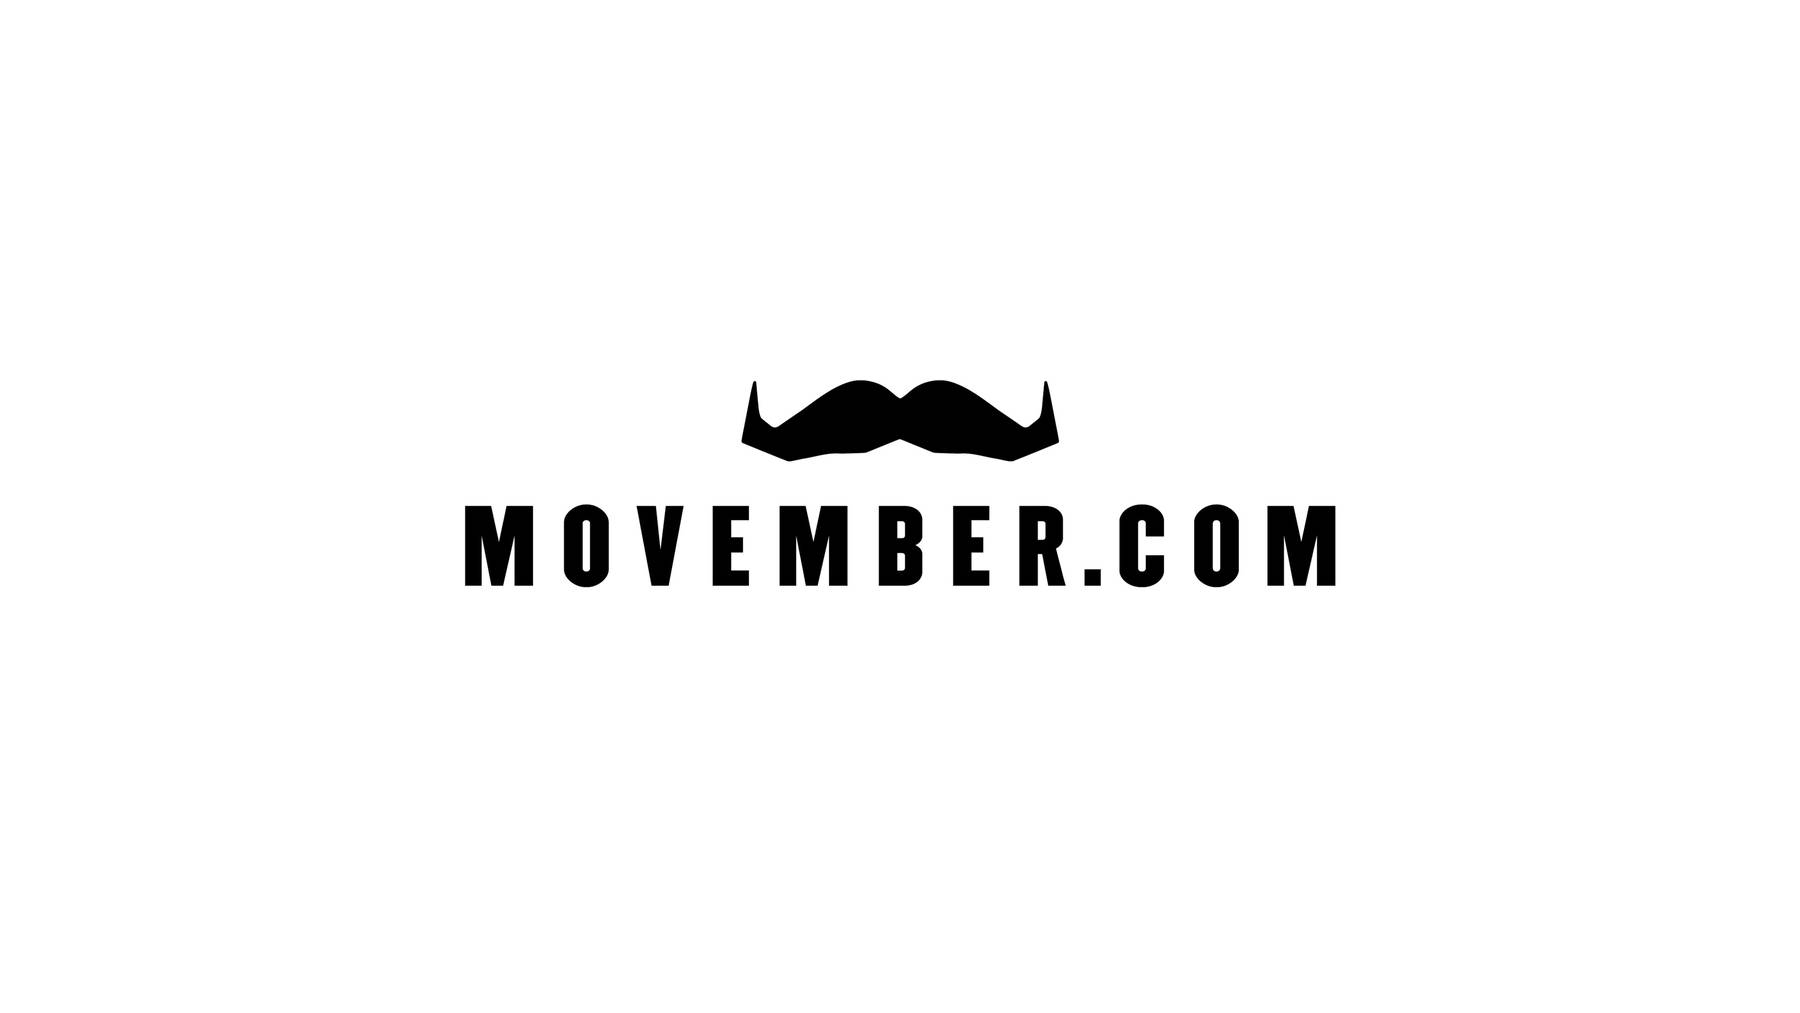 Movember%20Foundation_Movember.com_Stack_Black